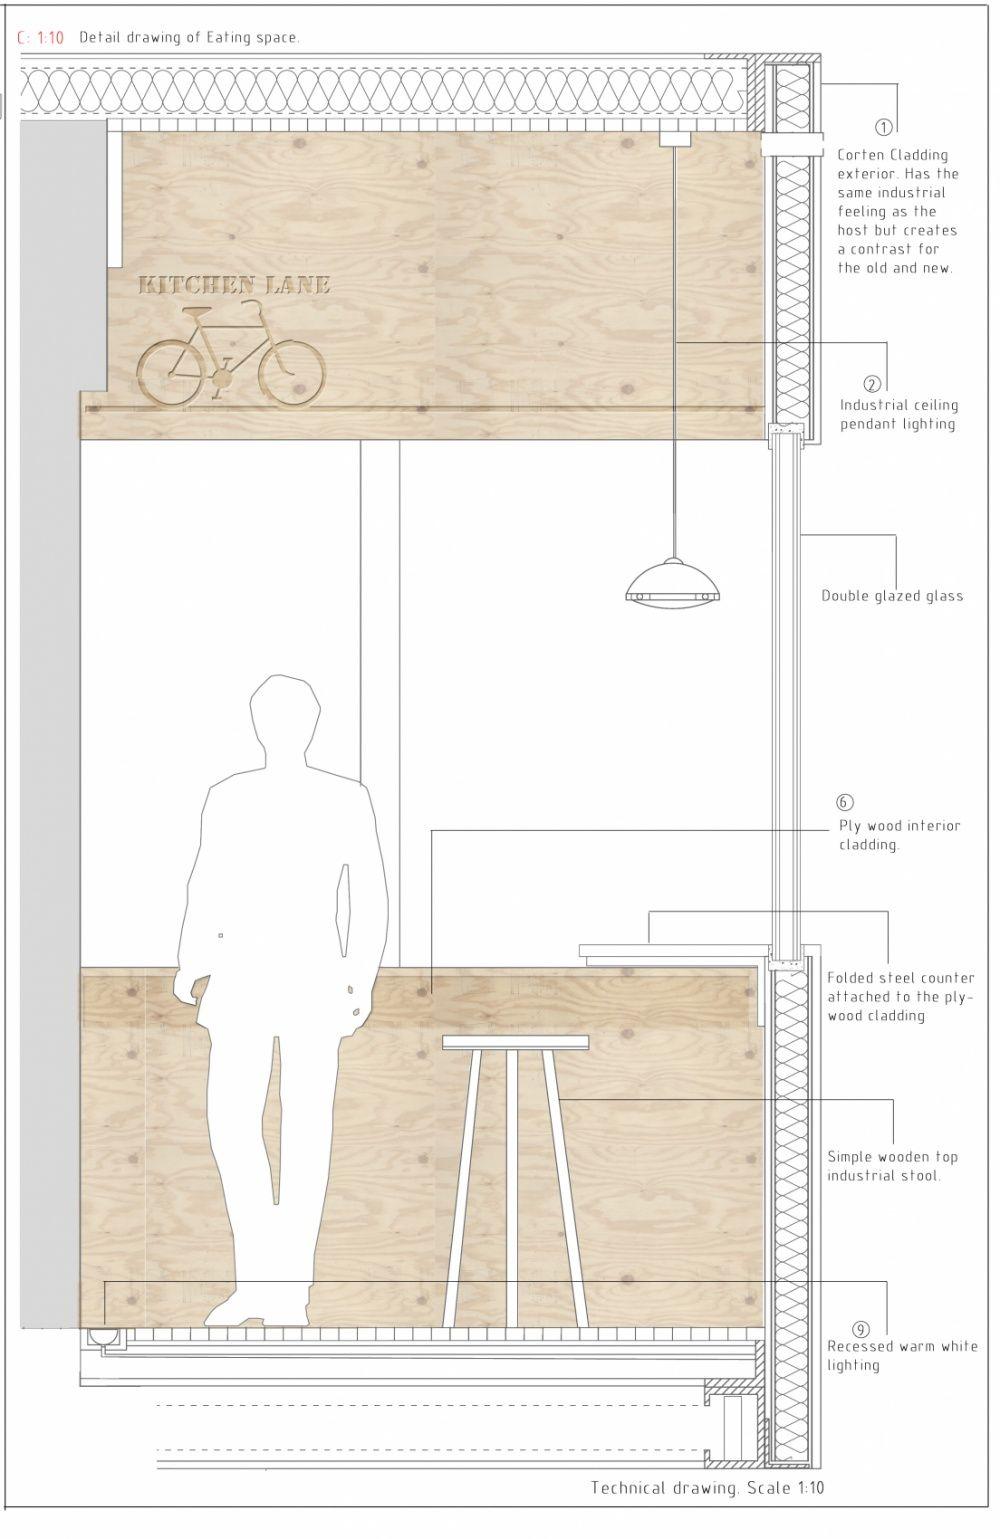 Uncategorized Kitchen Details And Design kitchen lane marianne khan design nice technical drawing drawingrendering